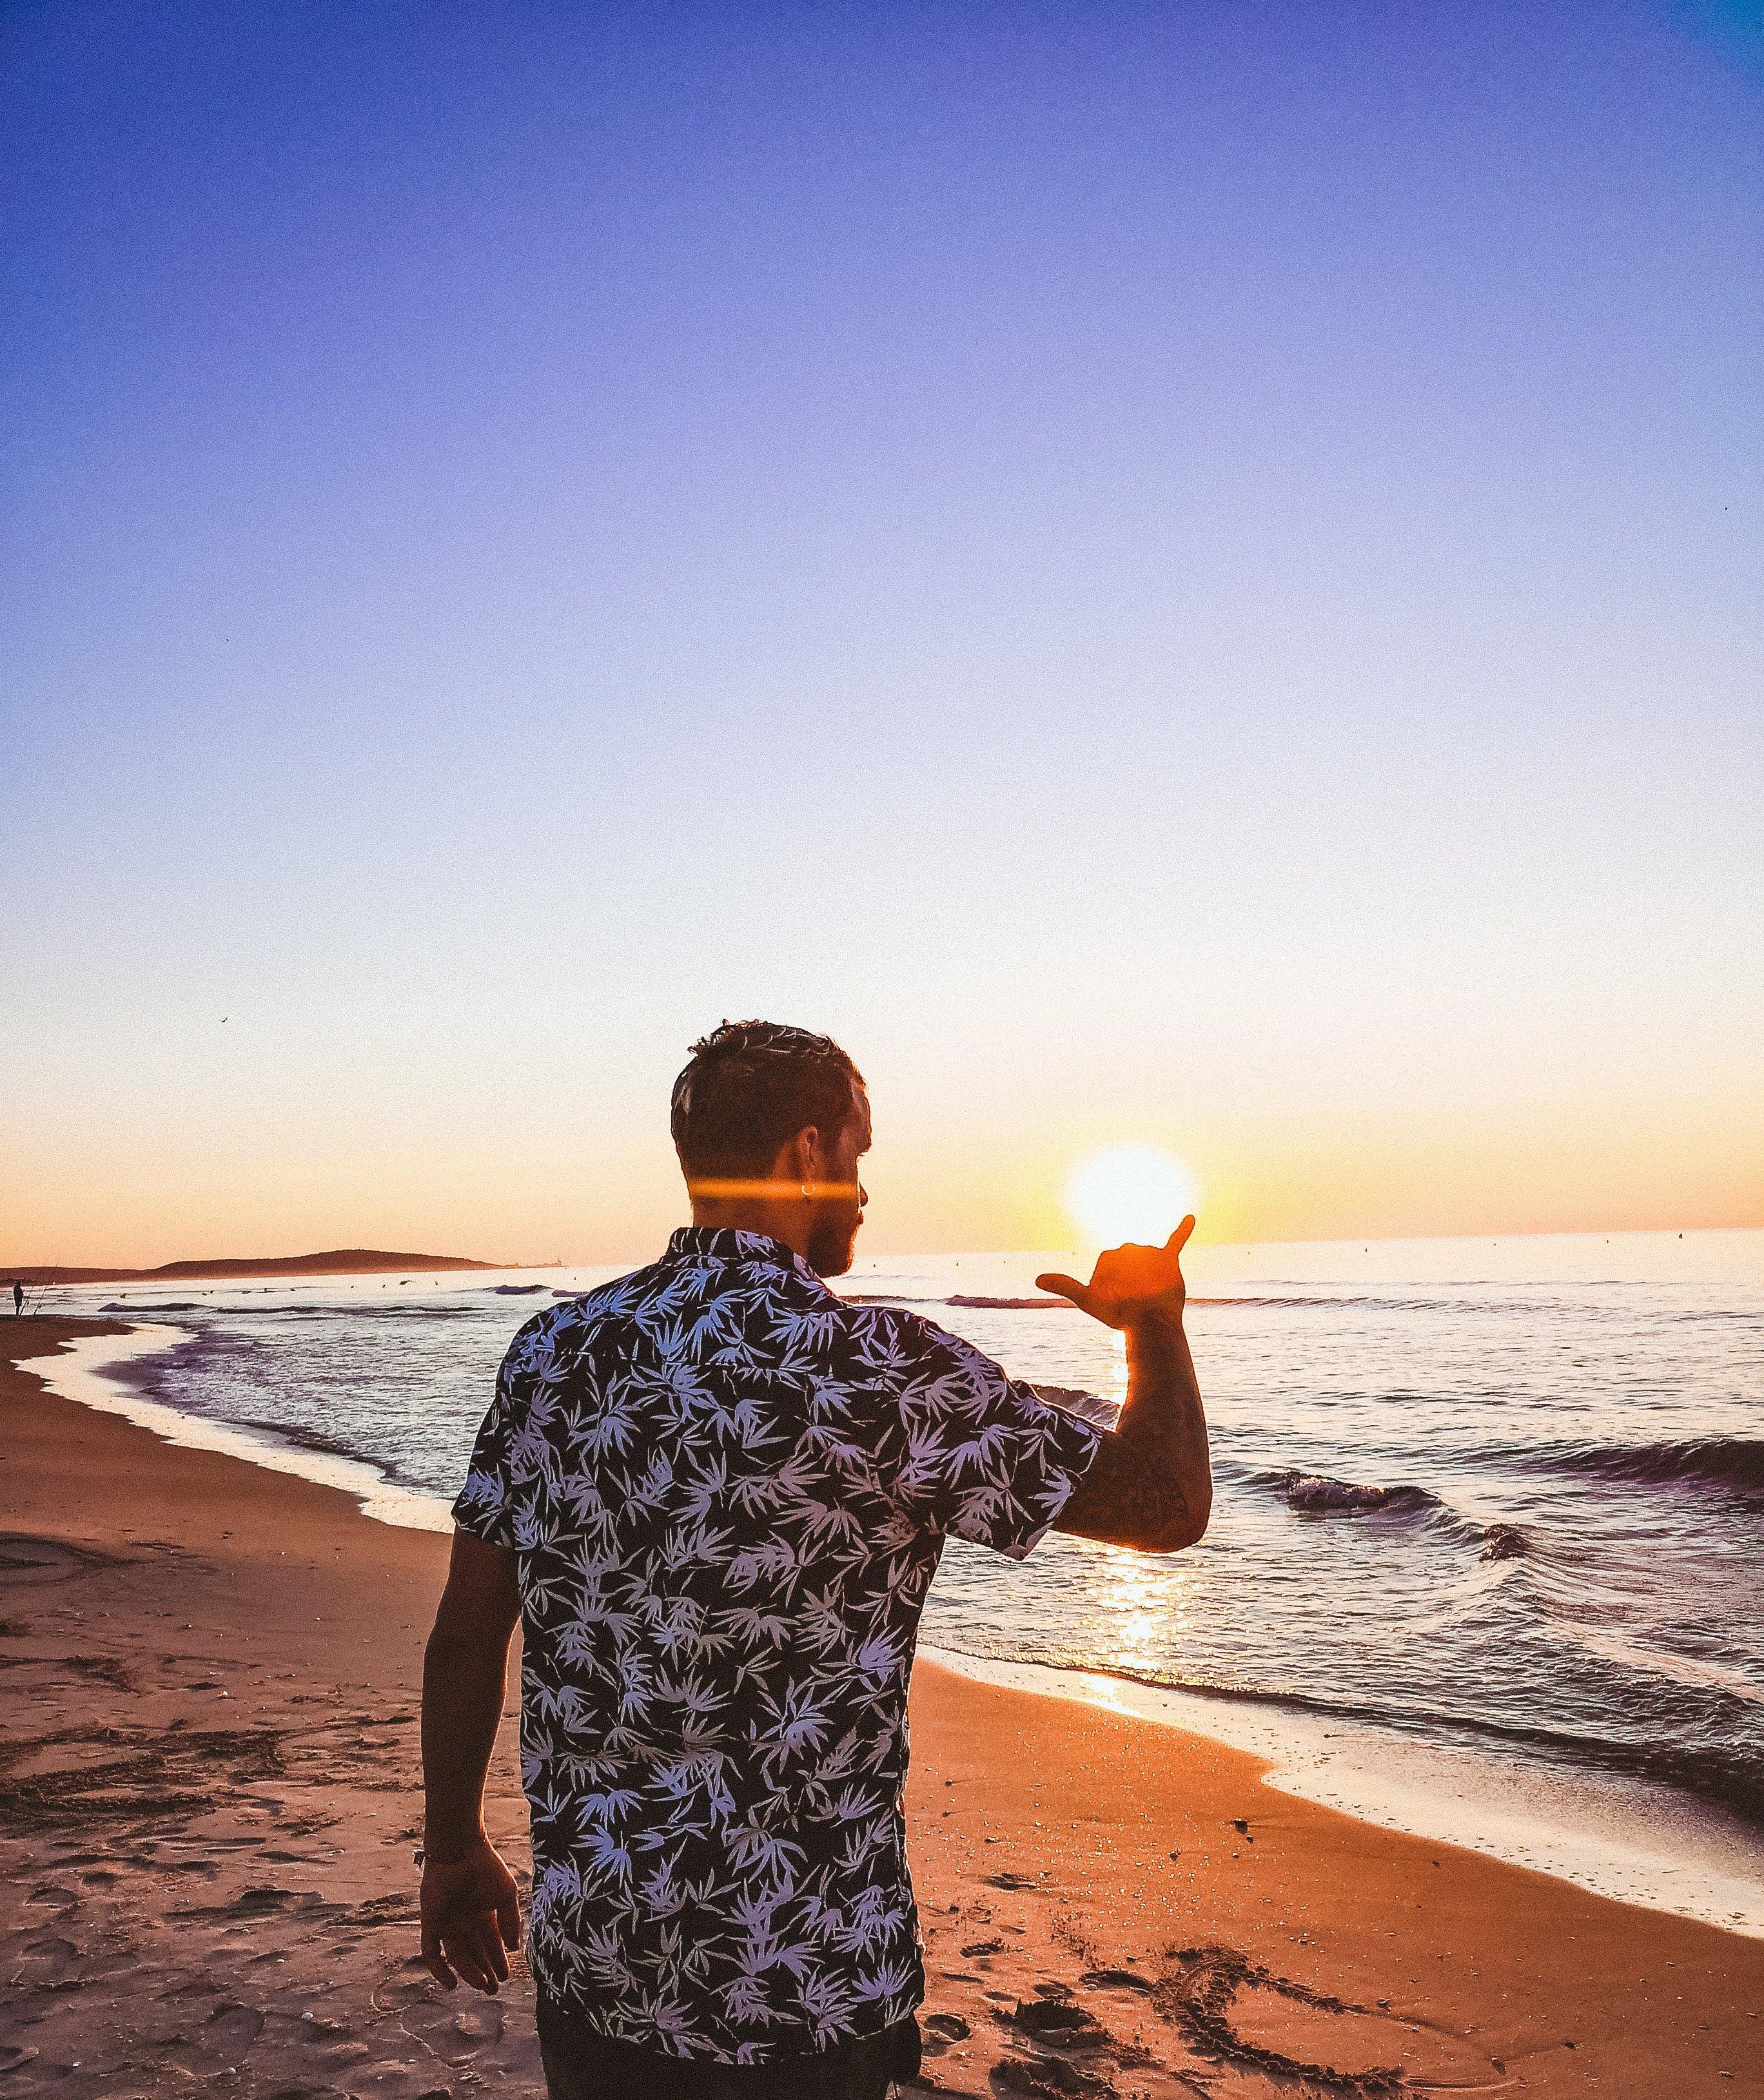 Kostenloses Stock Foto zu hebel de soleil, huawei, magnifique, marseillan